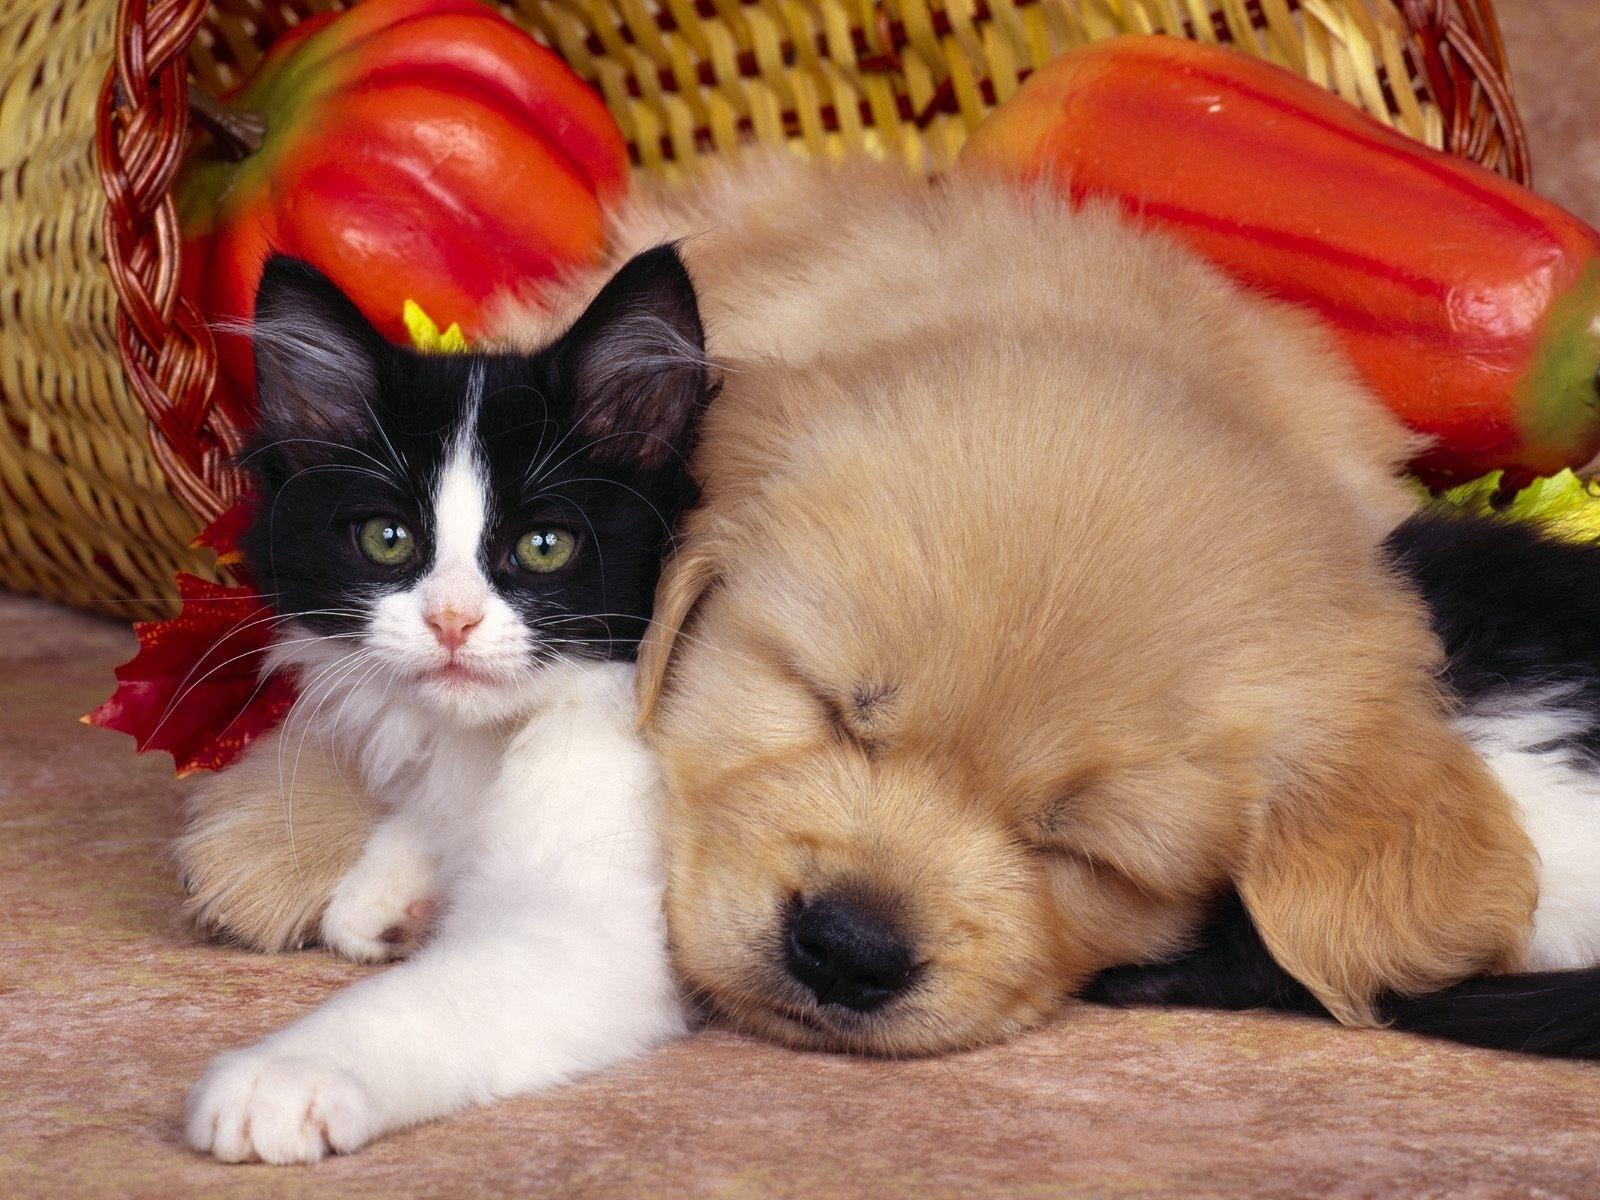 8396 descargar fondo de pantalla Animales, Gatos, Perros: protectores de pantalla e imágenes gratis